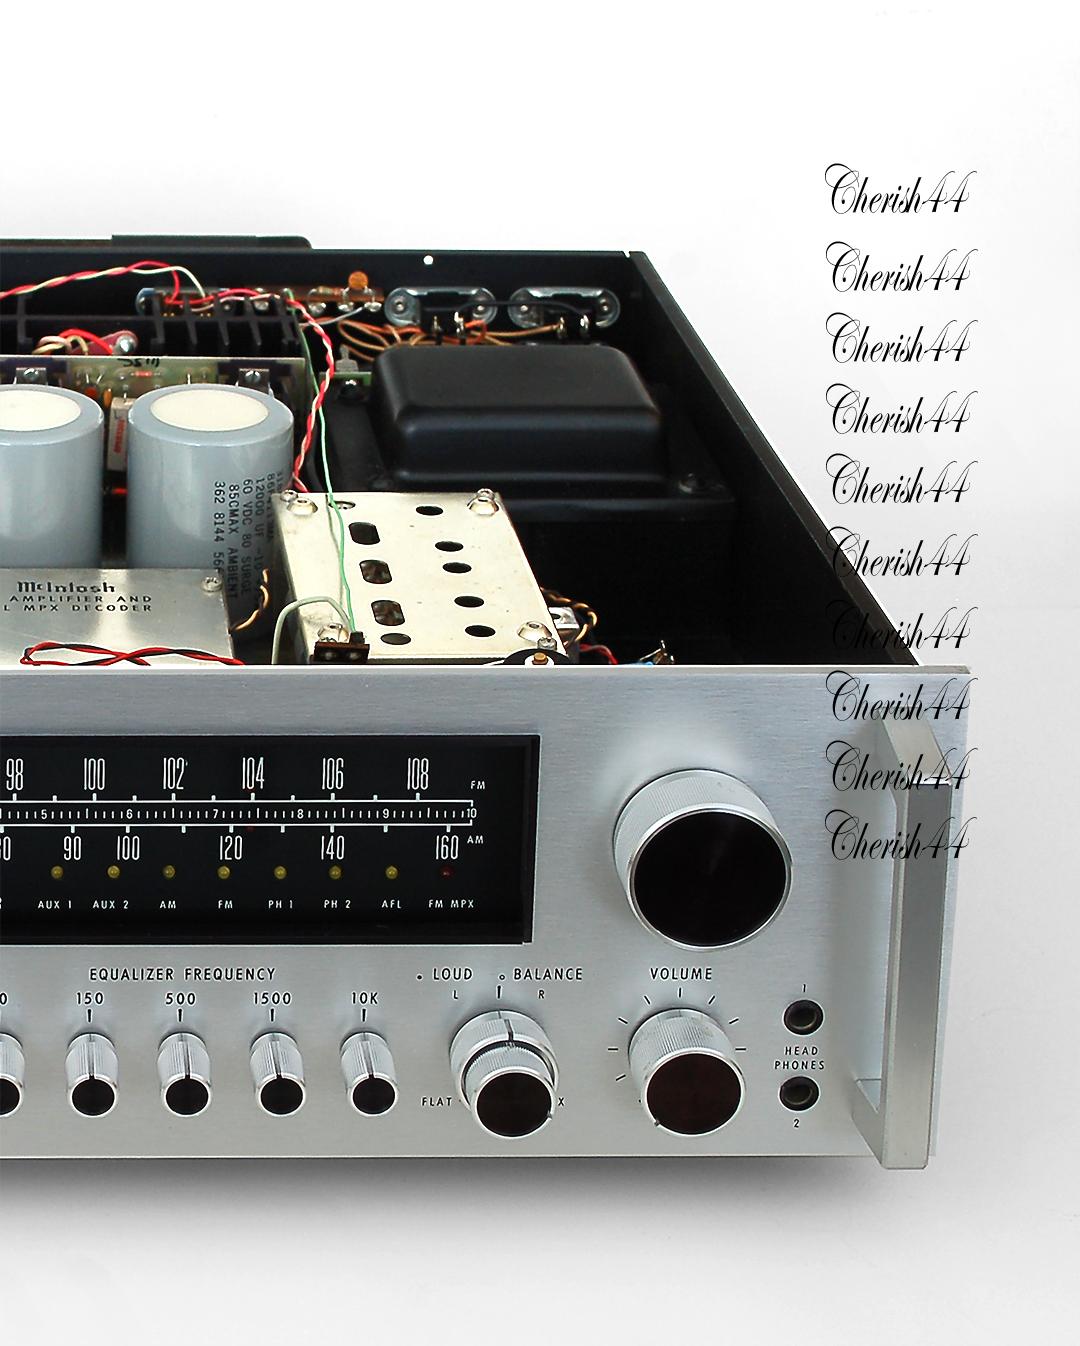 MAC 4100 - 4